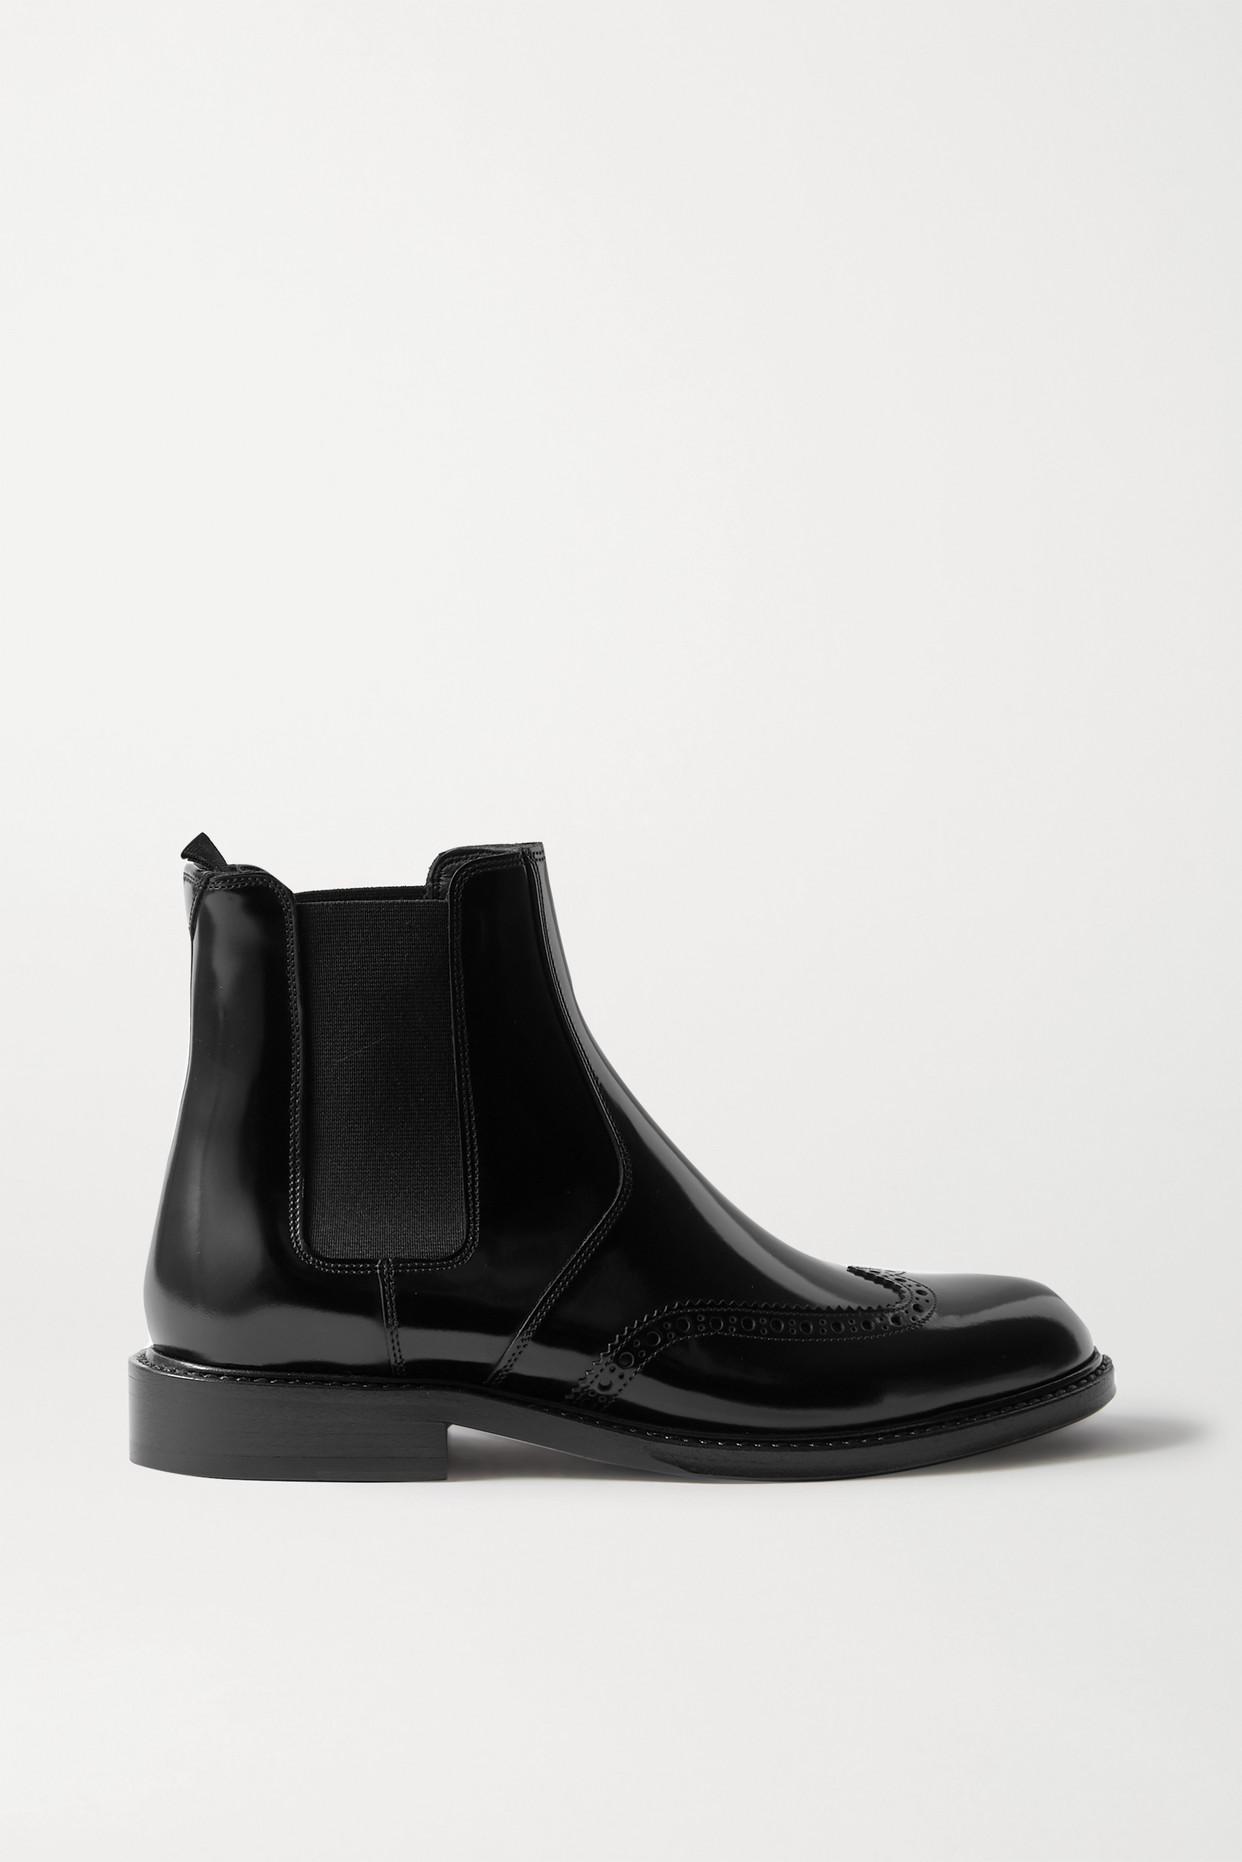 SAINT LAURENT - Ceril Glossed-leather Chelsea Boots - Black - IT37